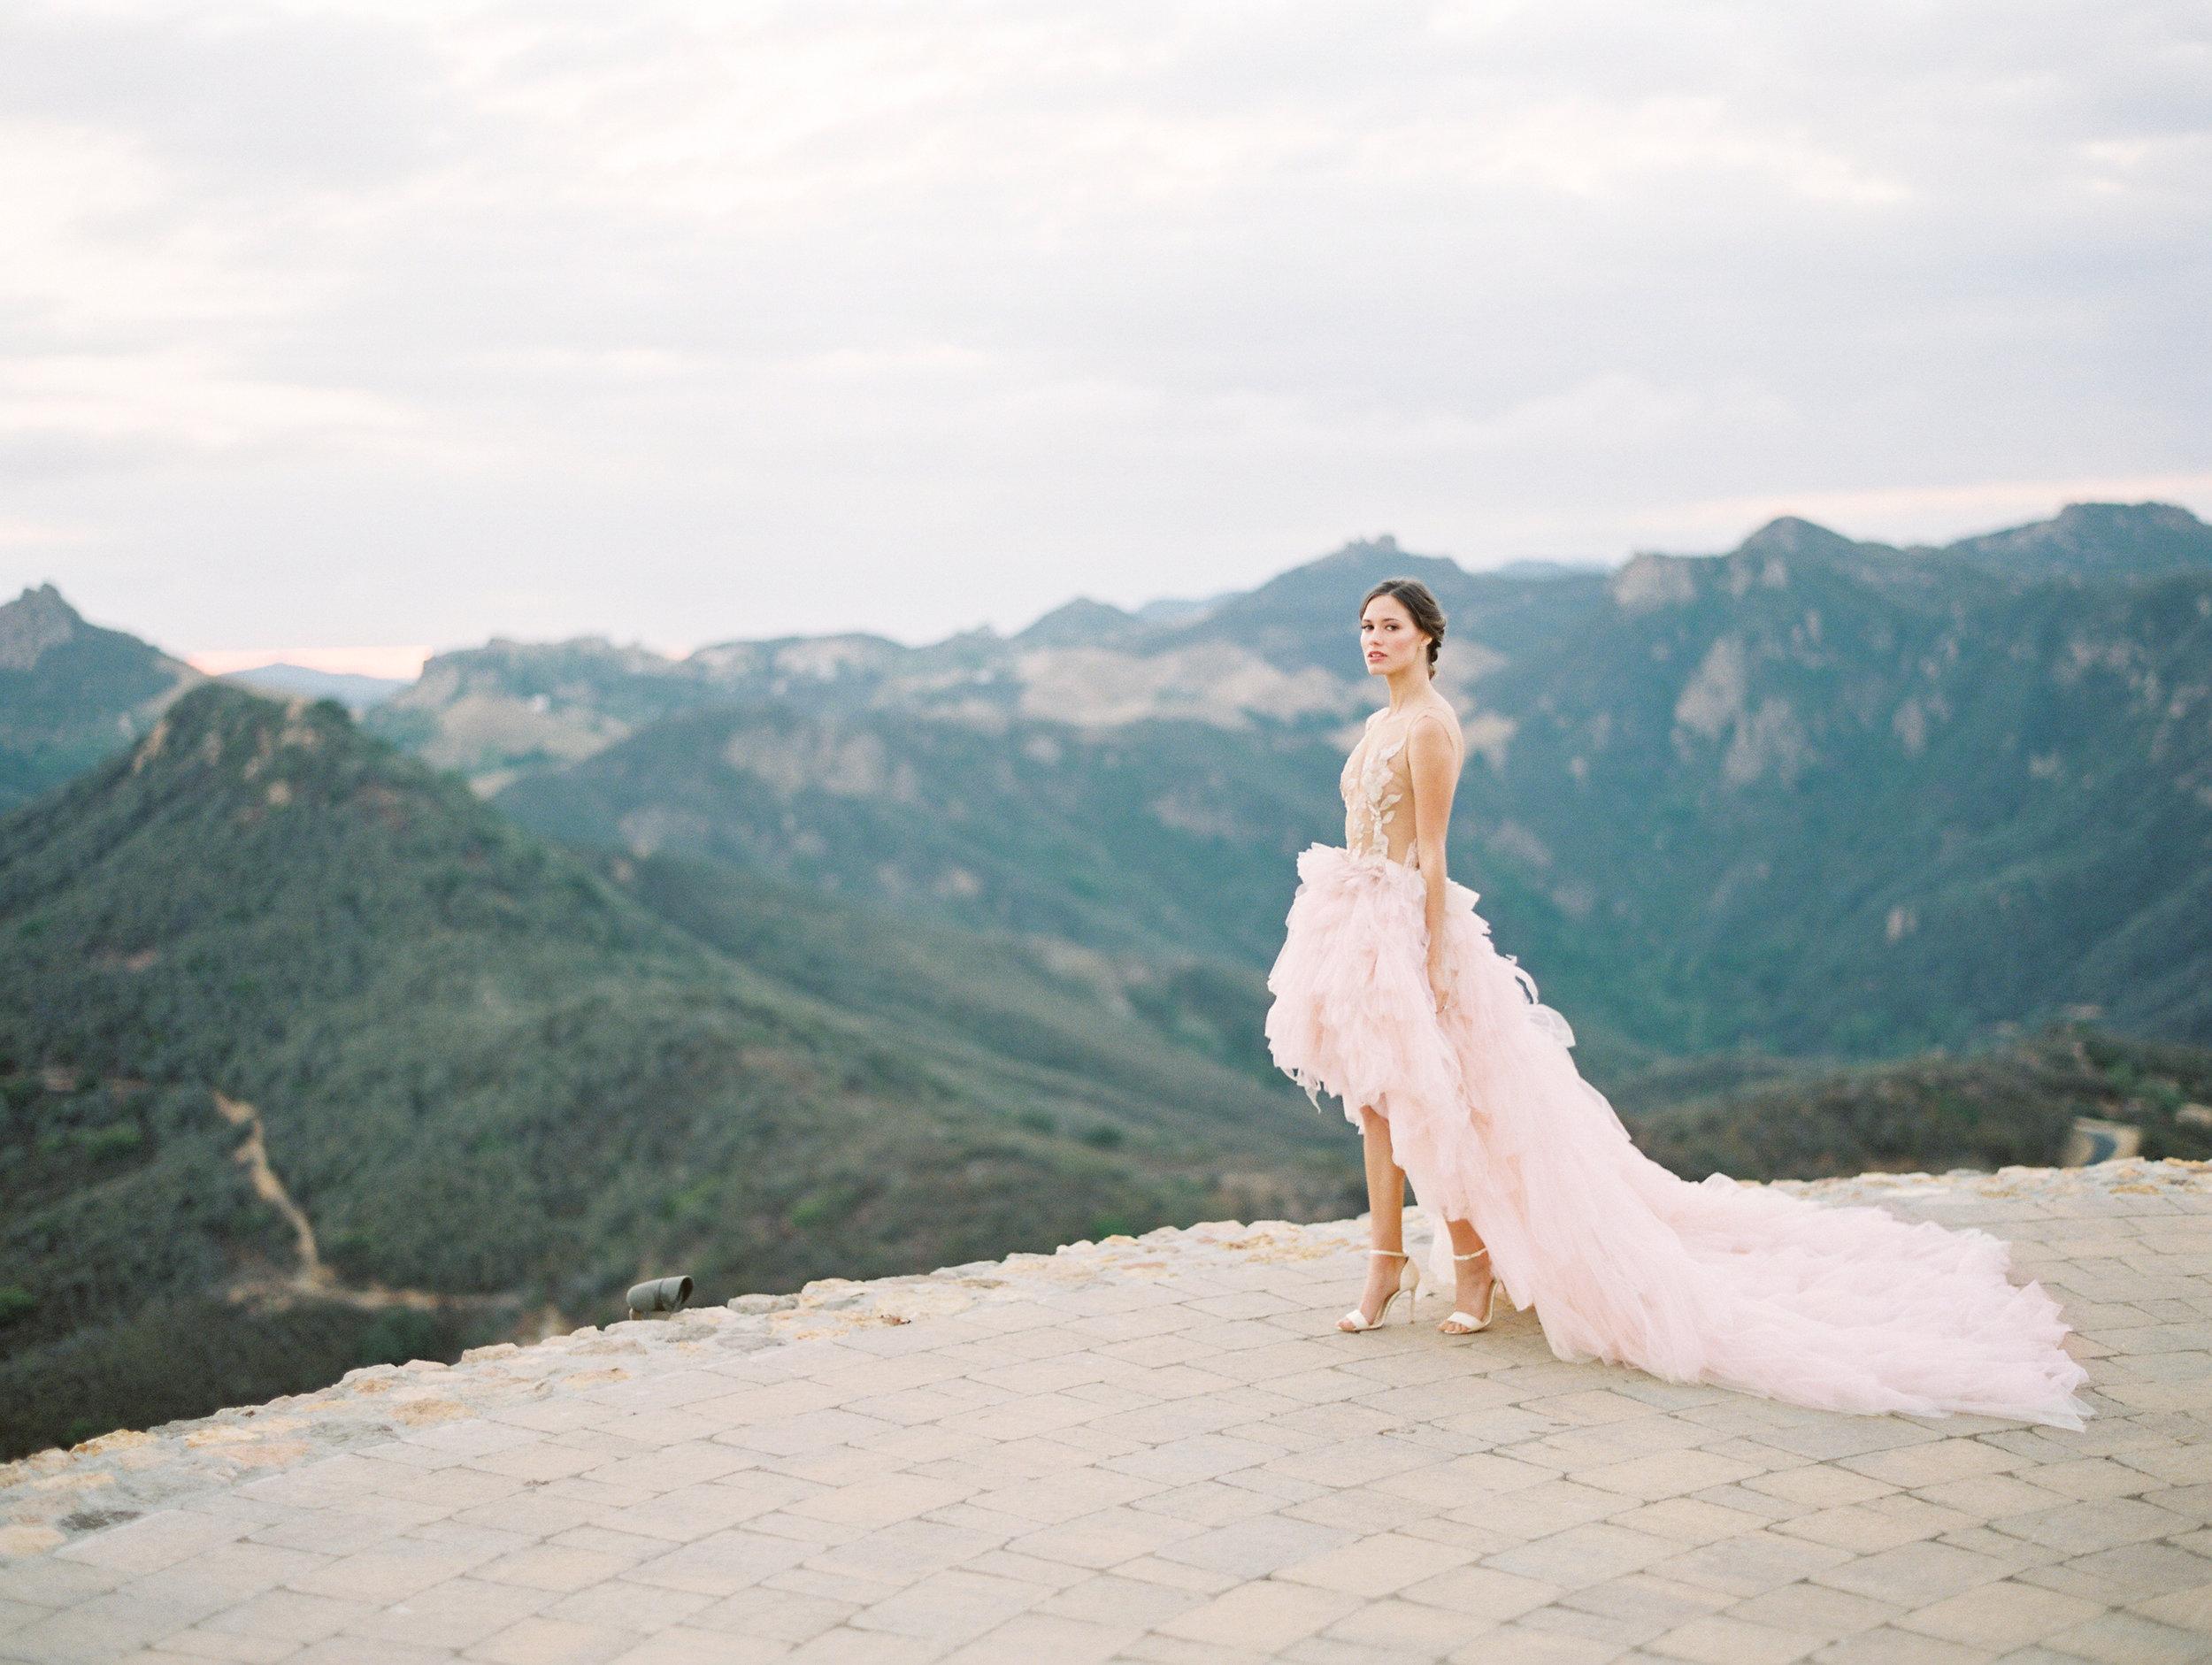 Malibu Rocky Oaks Wedding | Pura Soul Photography | Donny Zavala Workshop | Joy Proctor | Mauve Wedding | California Wedding | Outdoor Wedding | Joy Wed